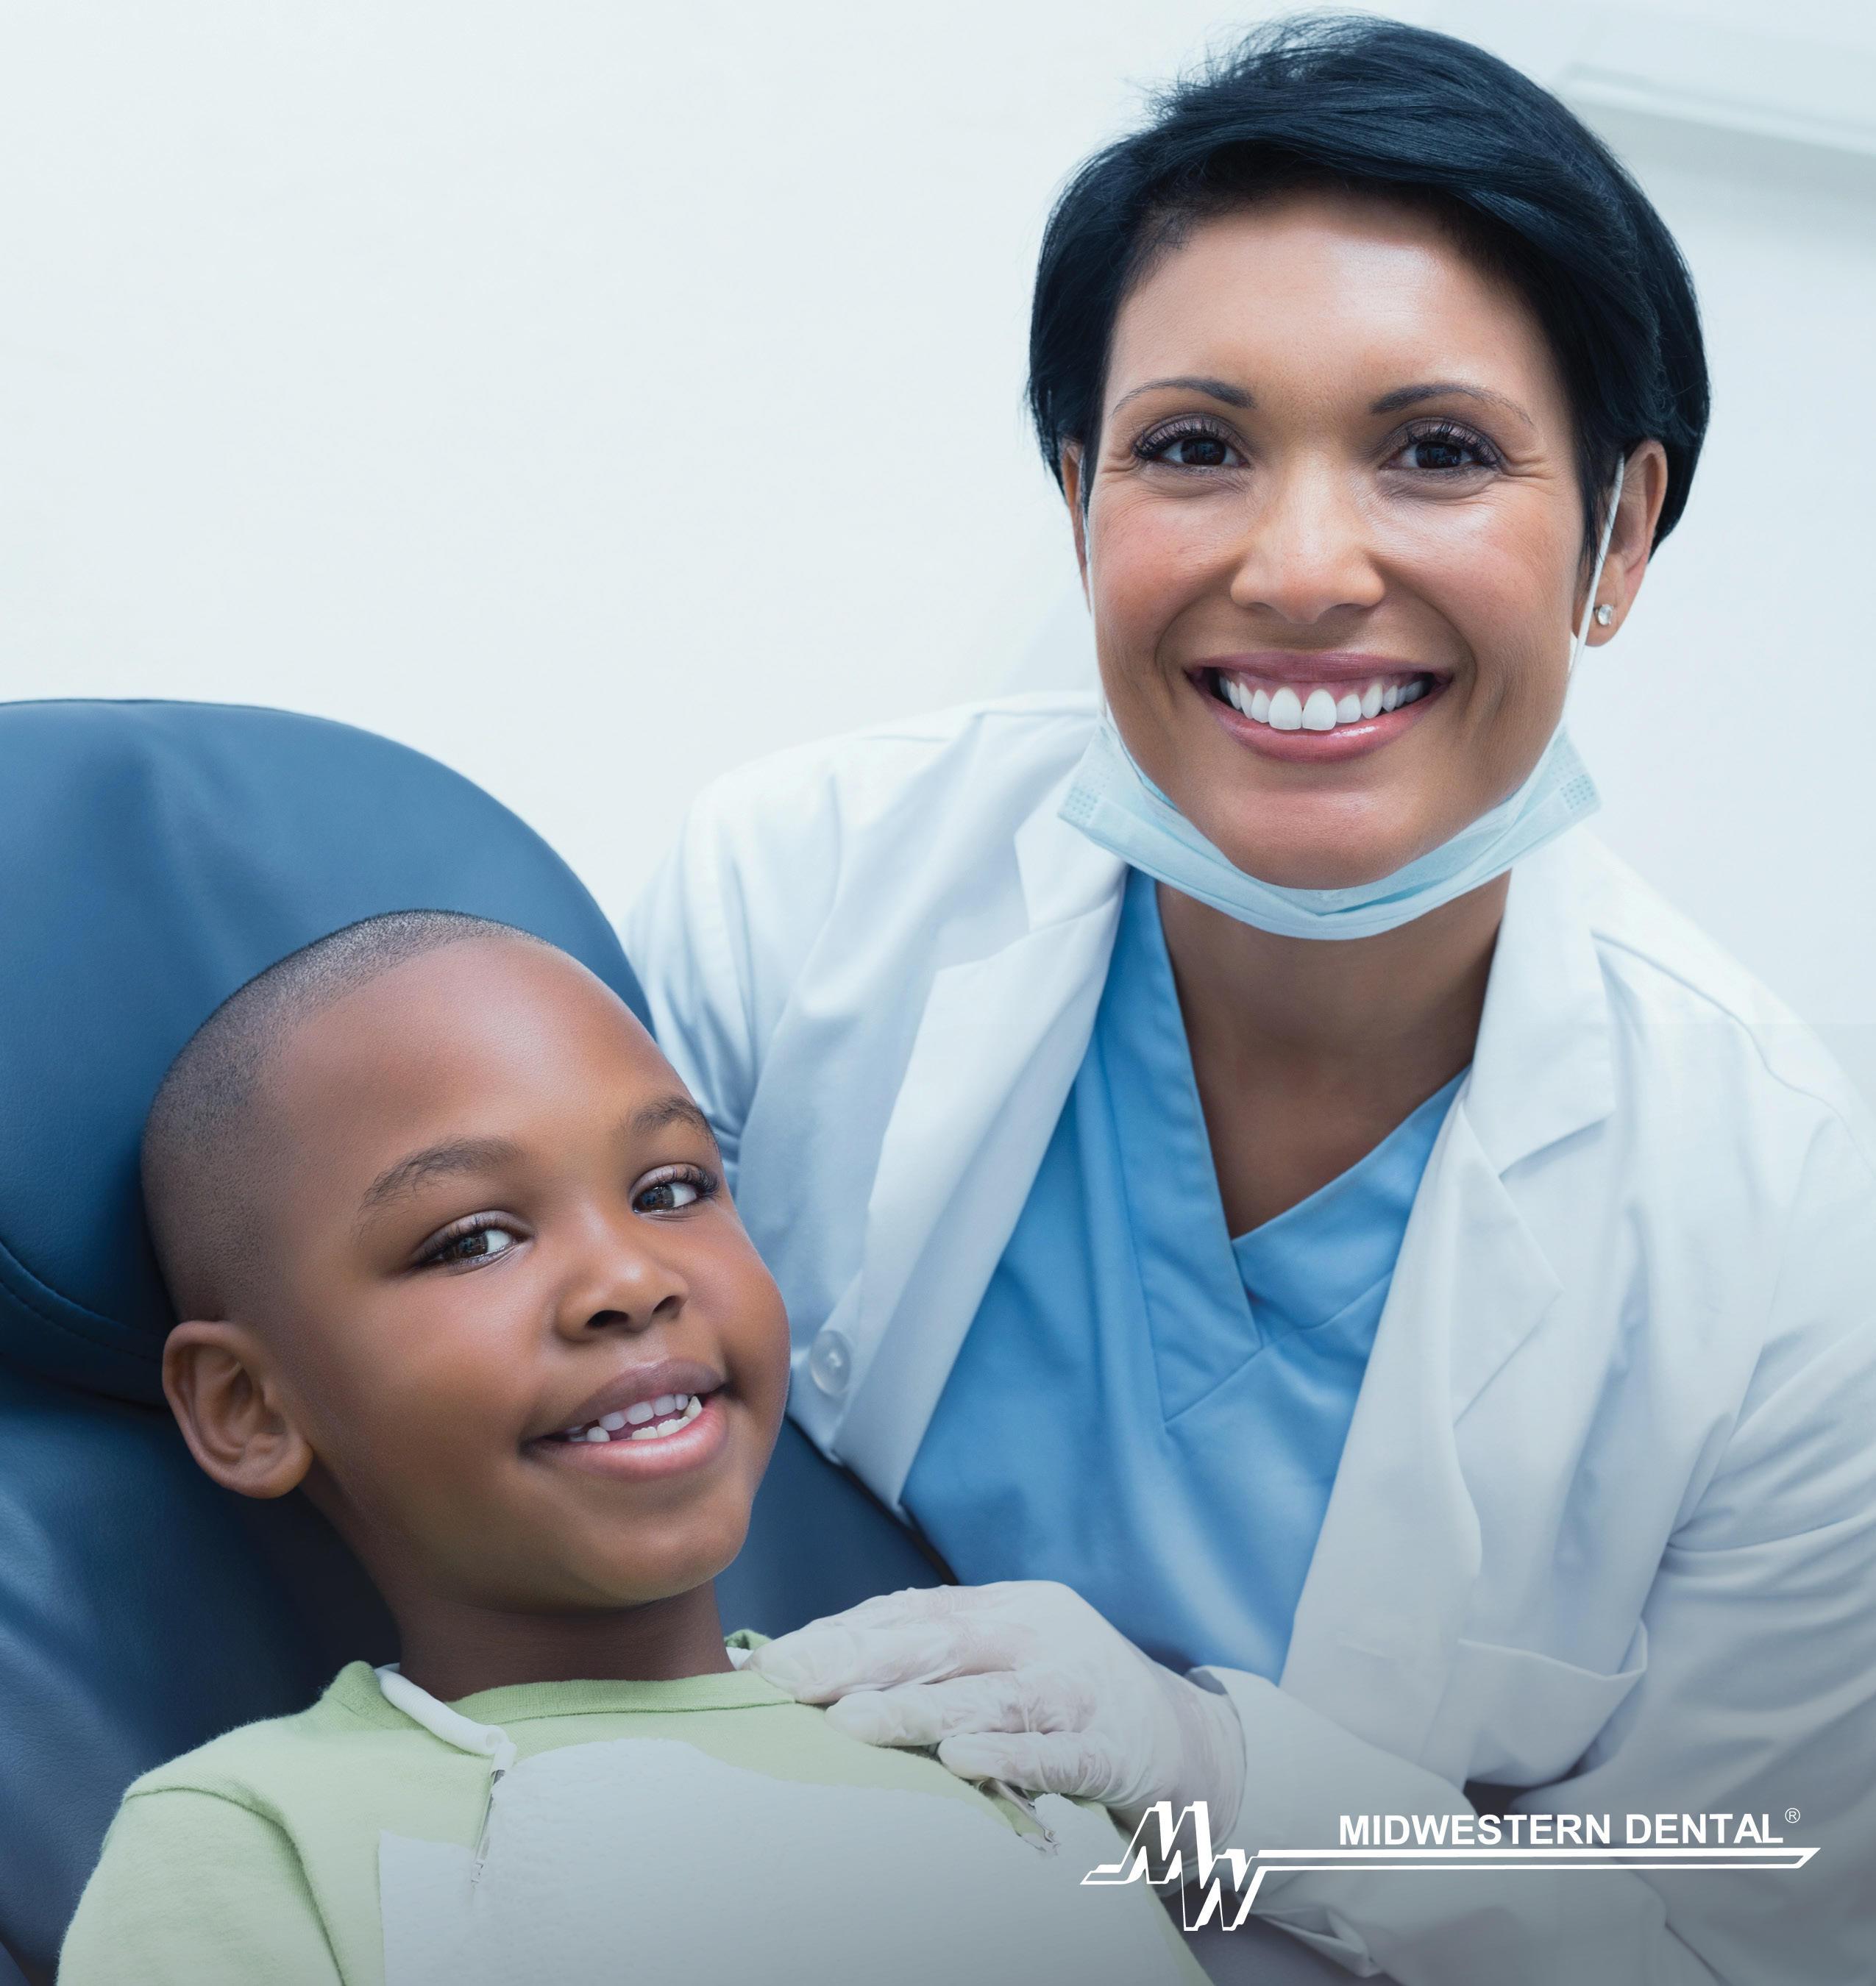 Midwestern Dental image 4